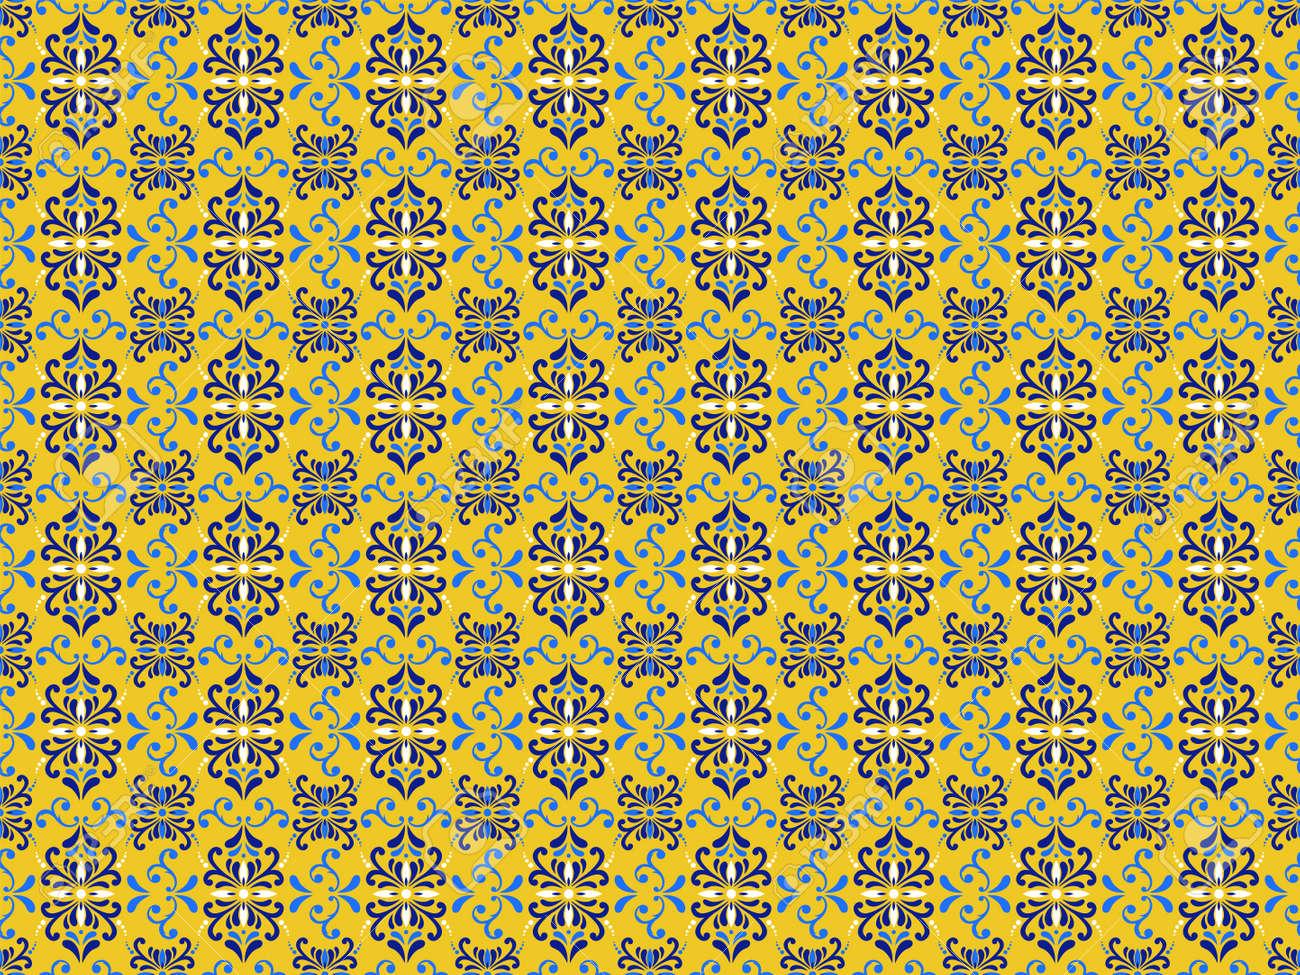 Azulejos Portuguese tile floor pattern - 173114925